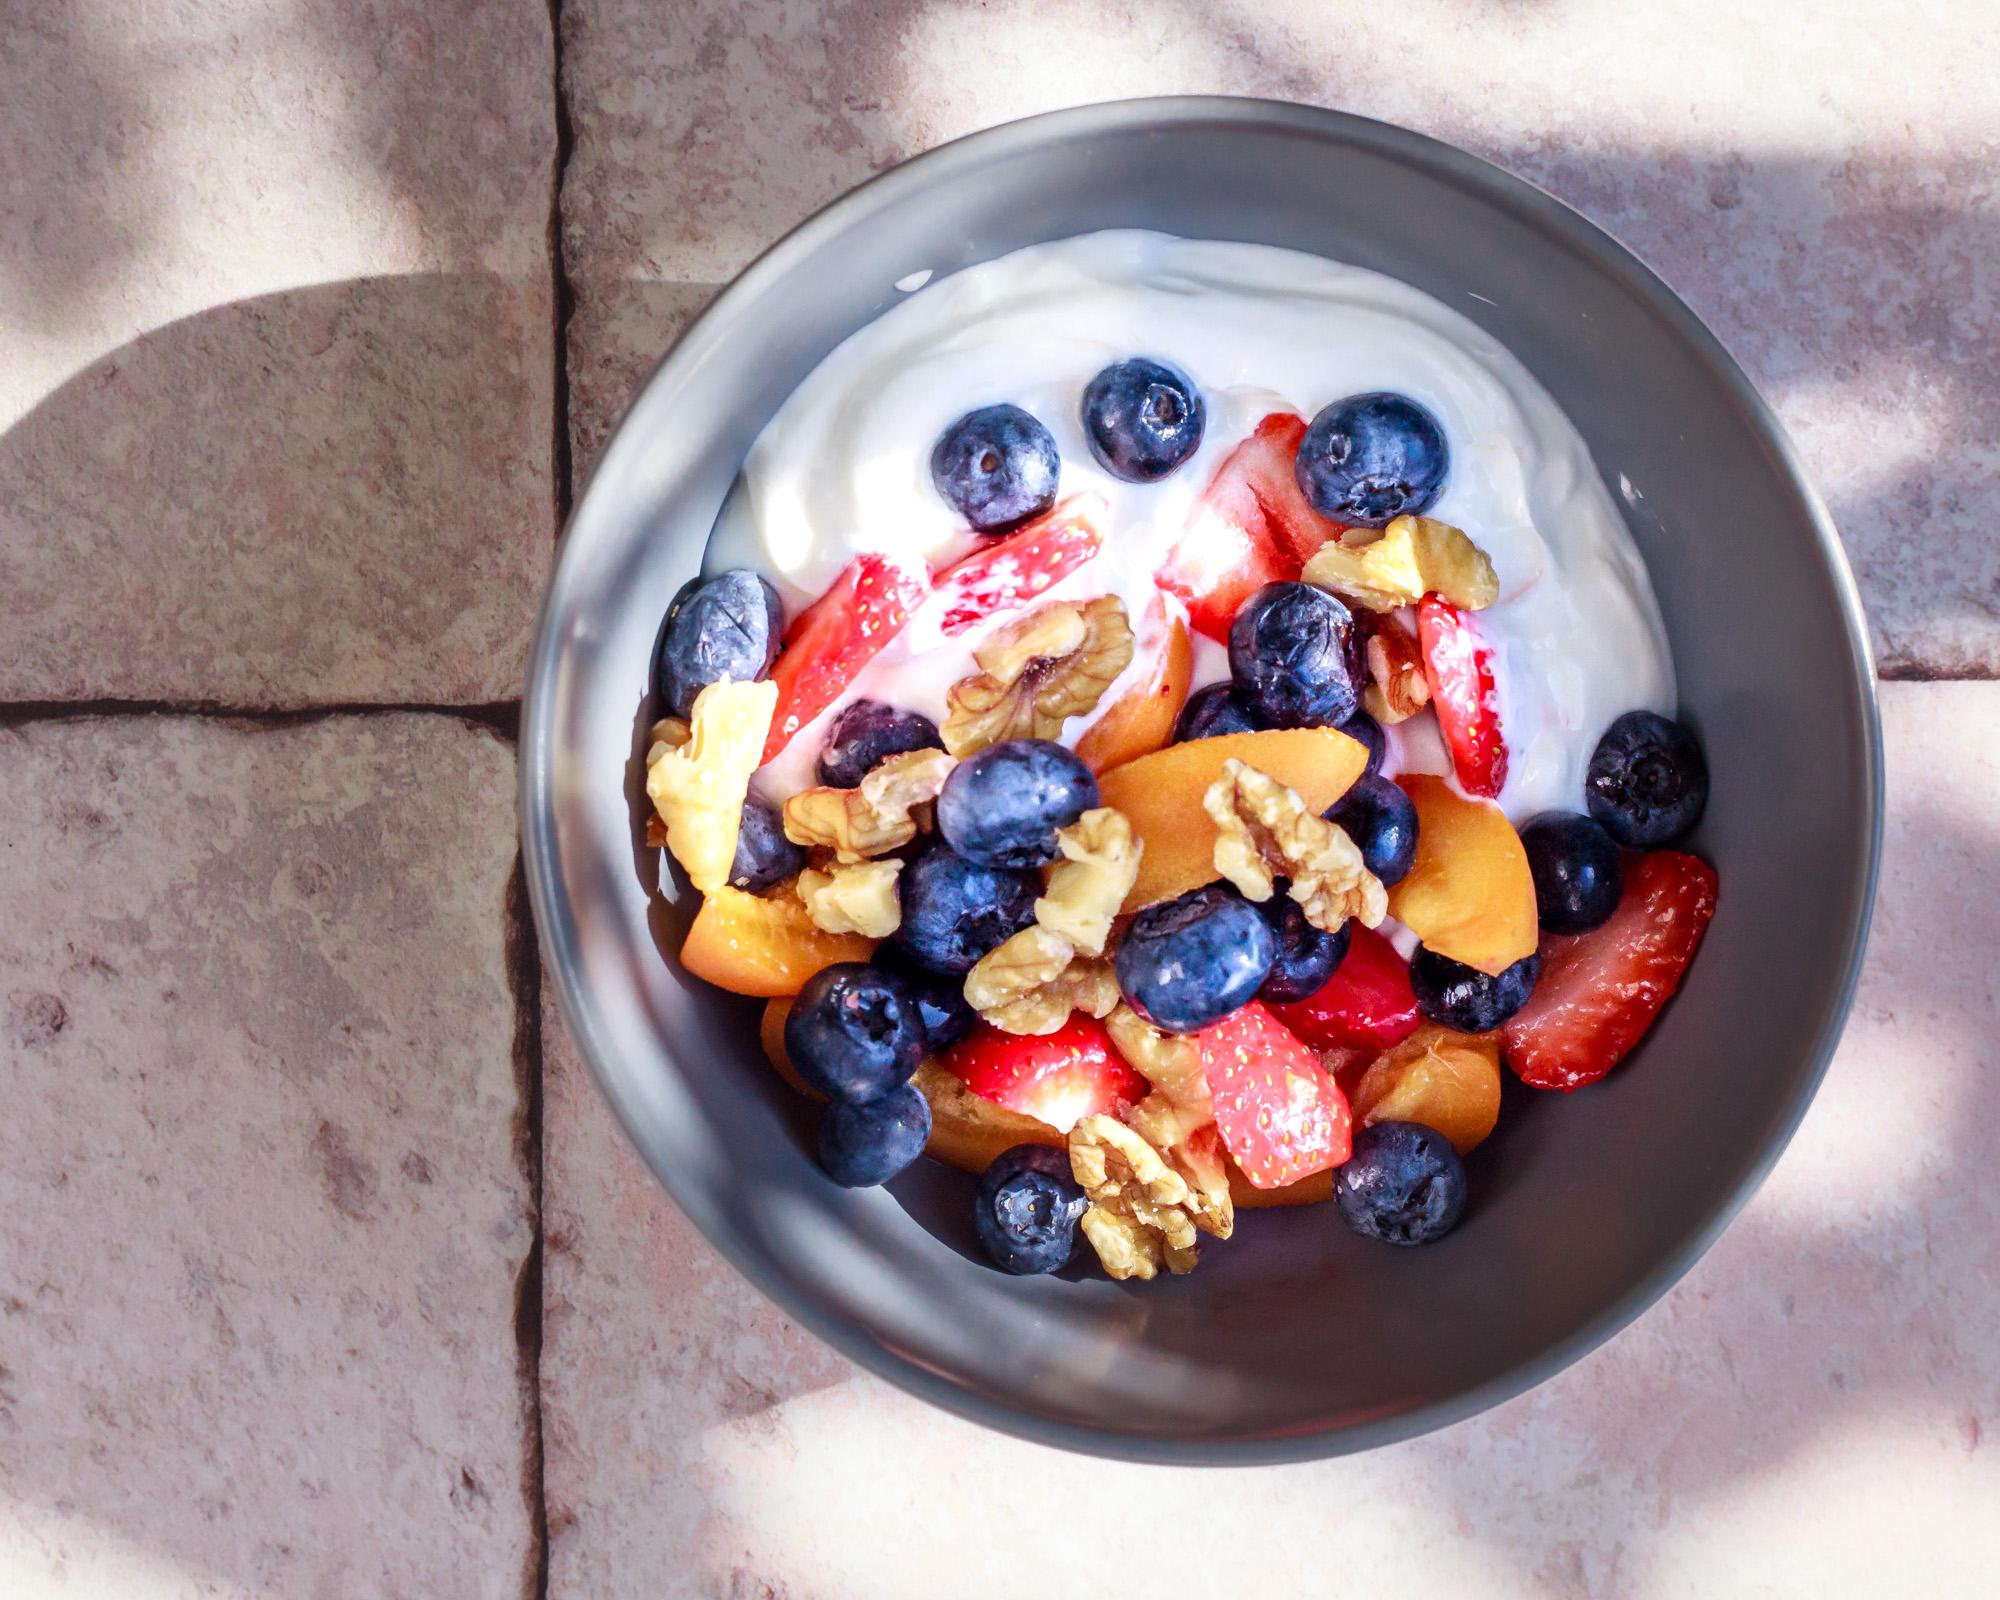 Breakfast Bowl in bright sunshine